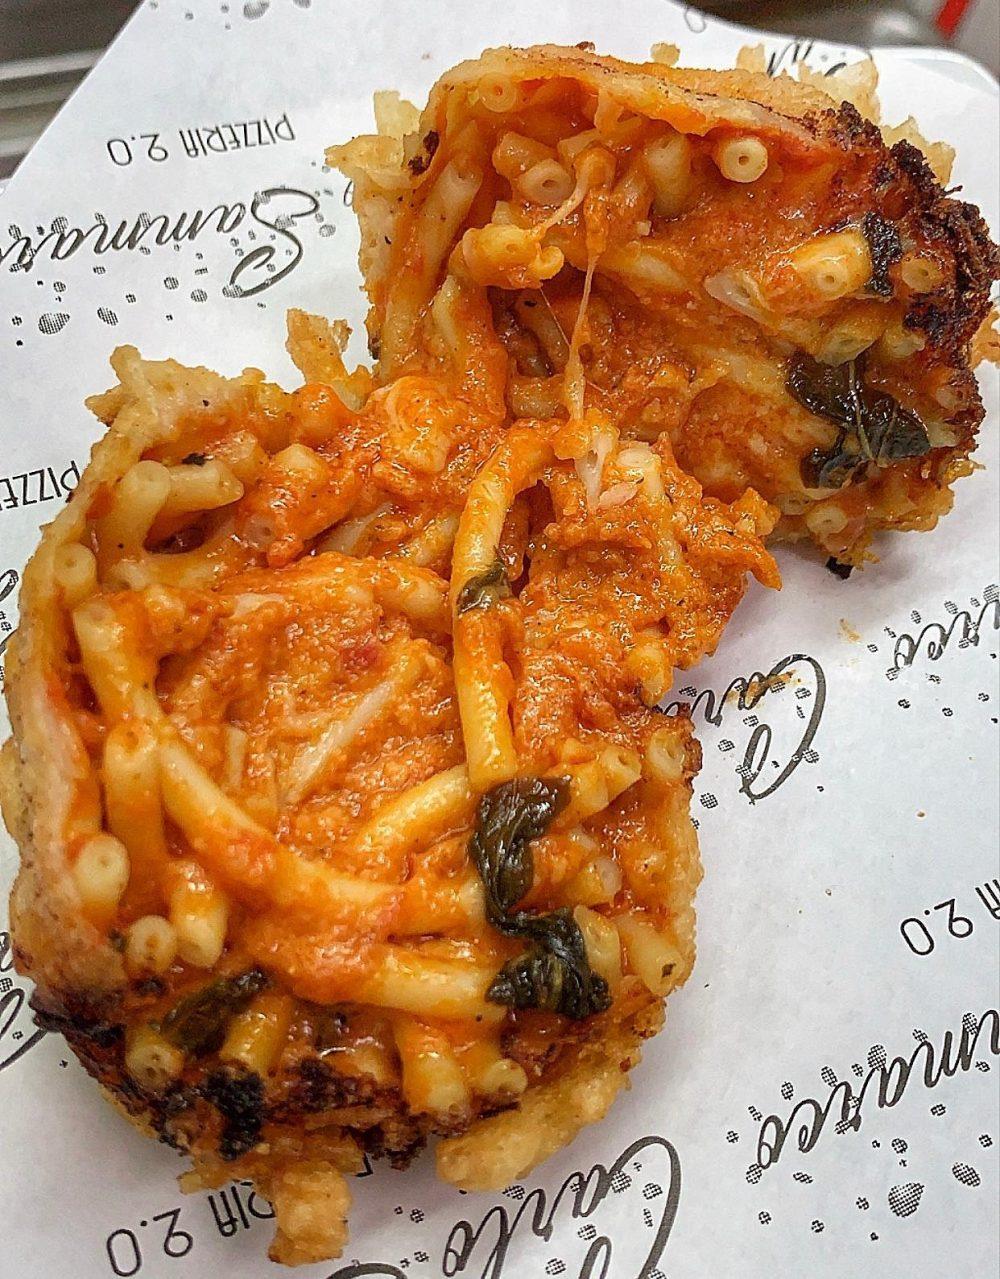 Carlo Sammarco Pizzeria 2.0 - frittatina Maccarona